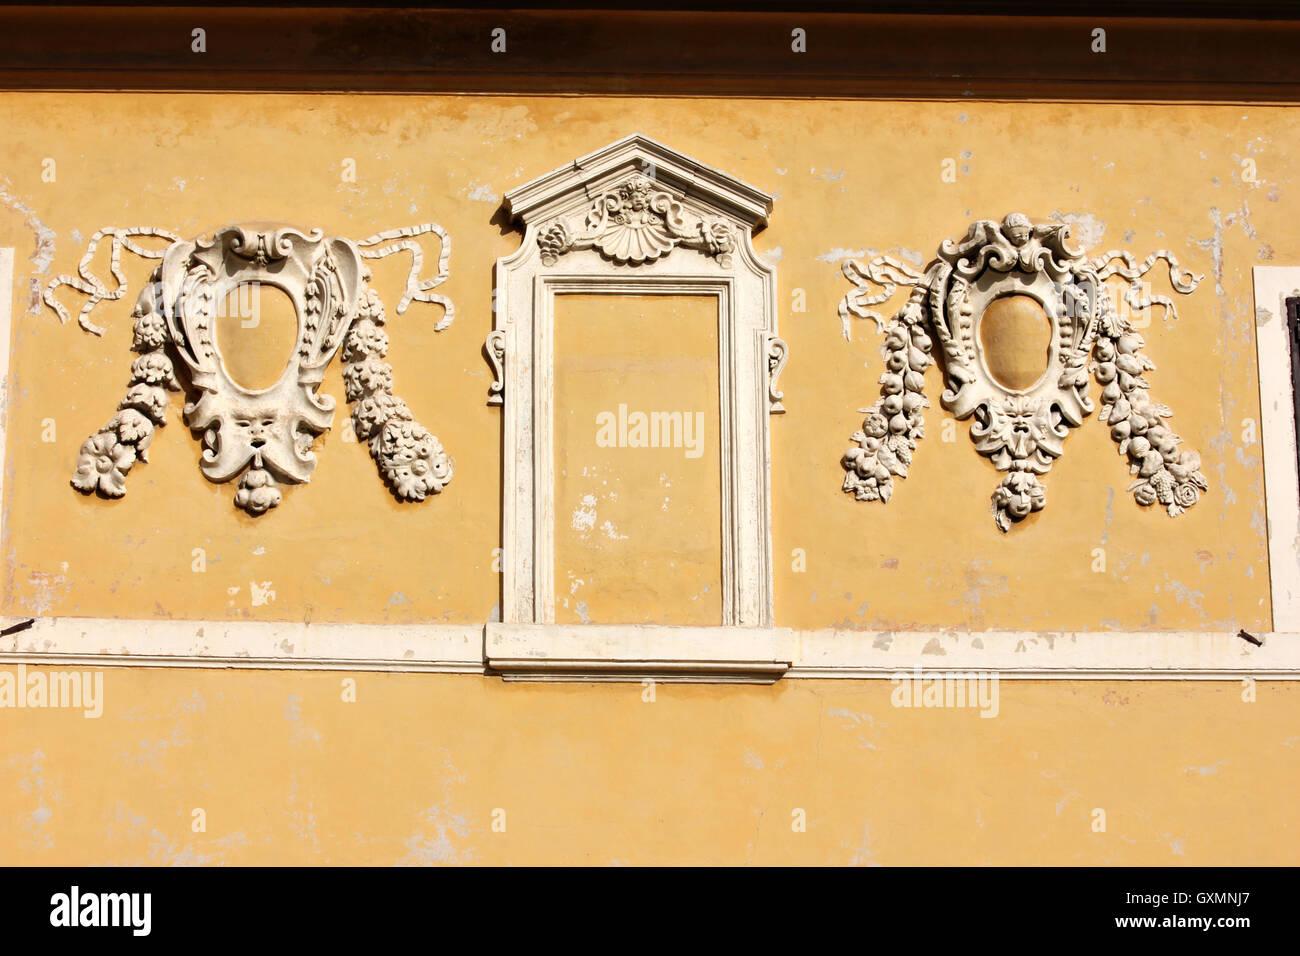 Stucco Italy Stock Photos & Stucco Italy Stock Images - Alamy